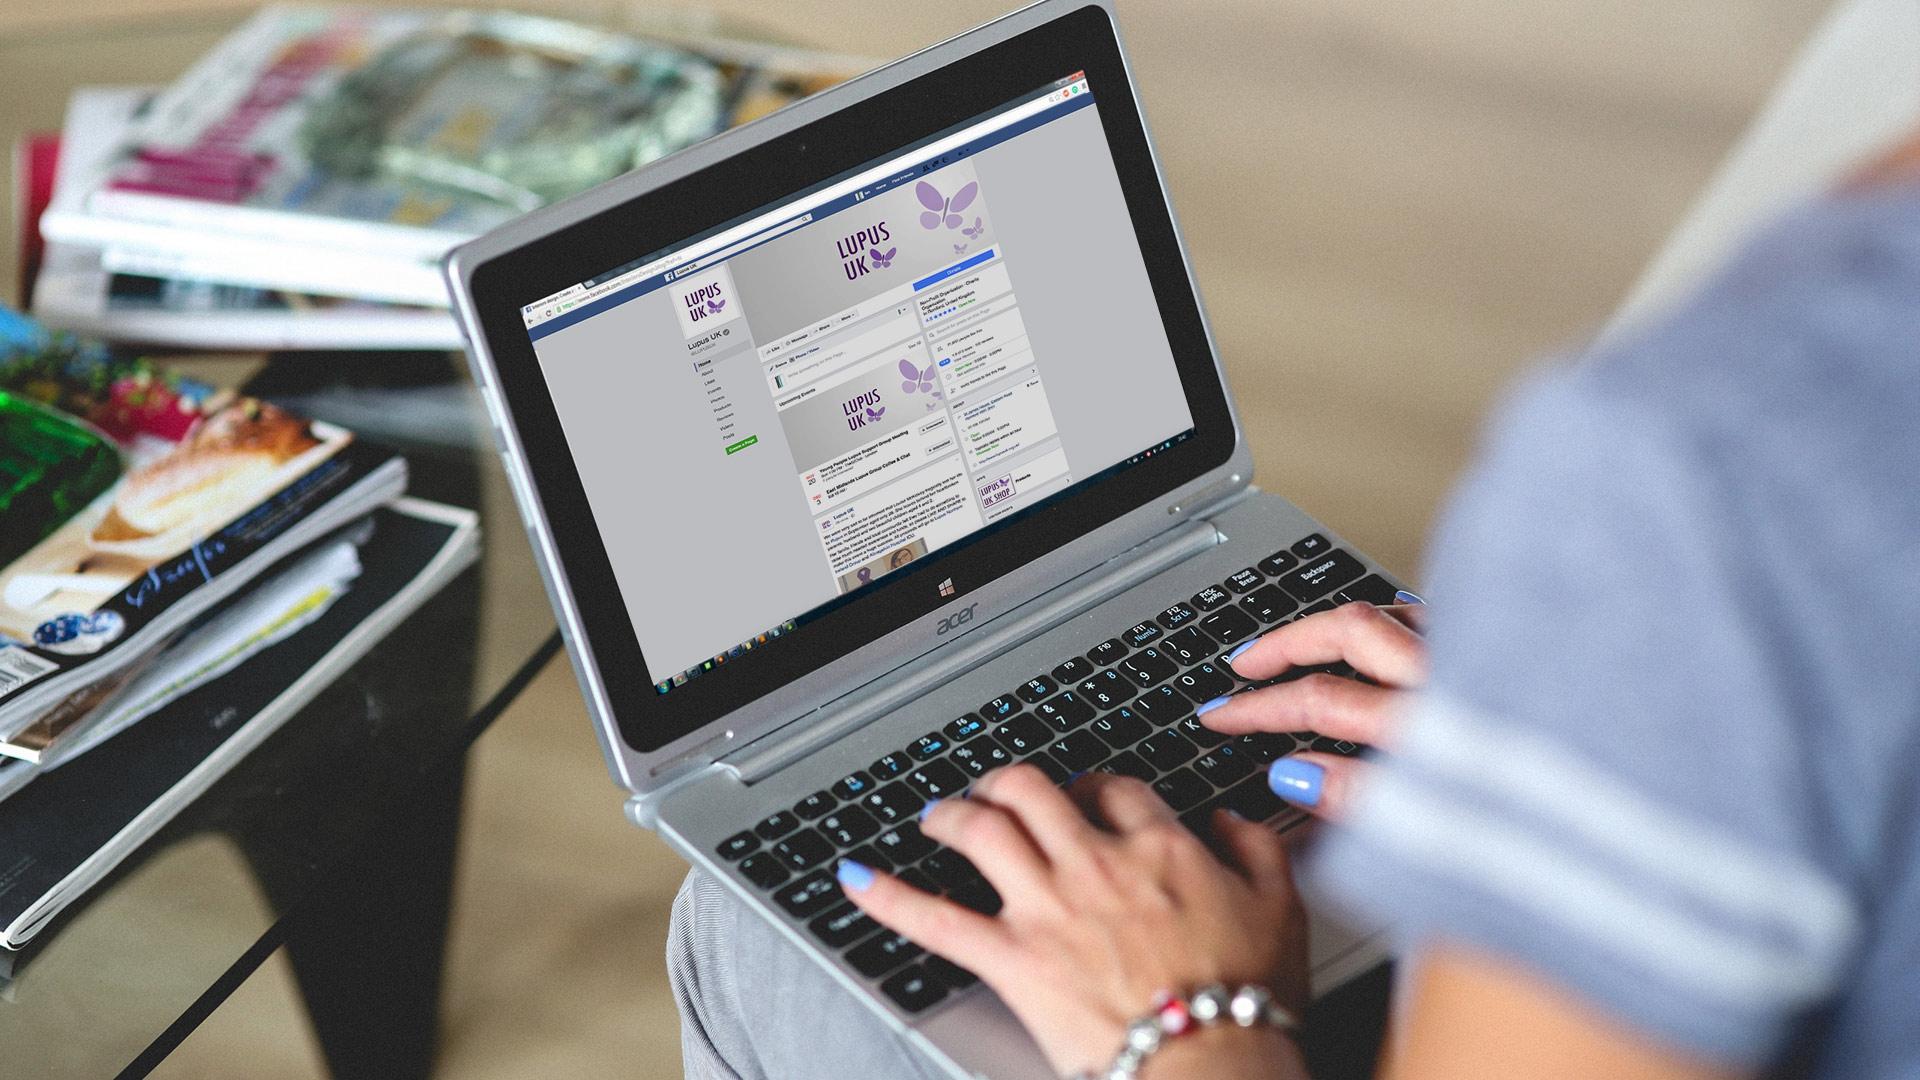 Thinking | Kingsland Linassi | Laptop Screen